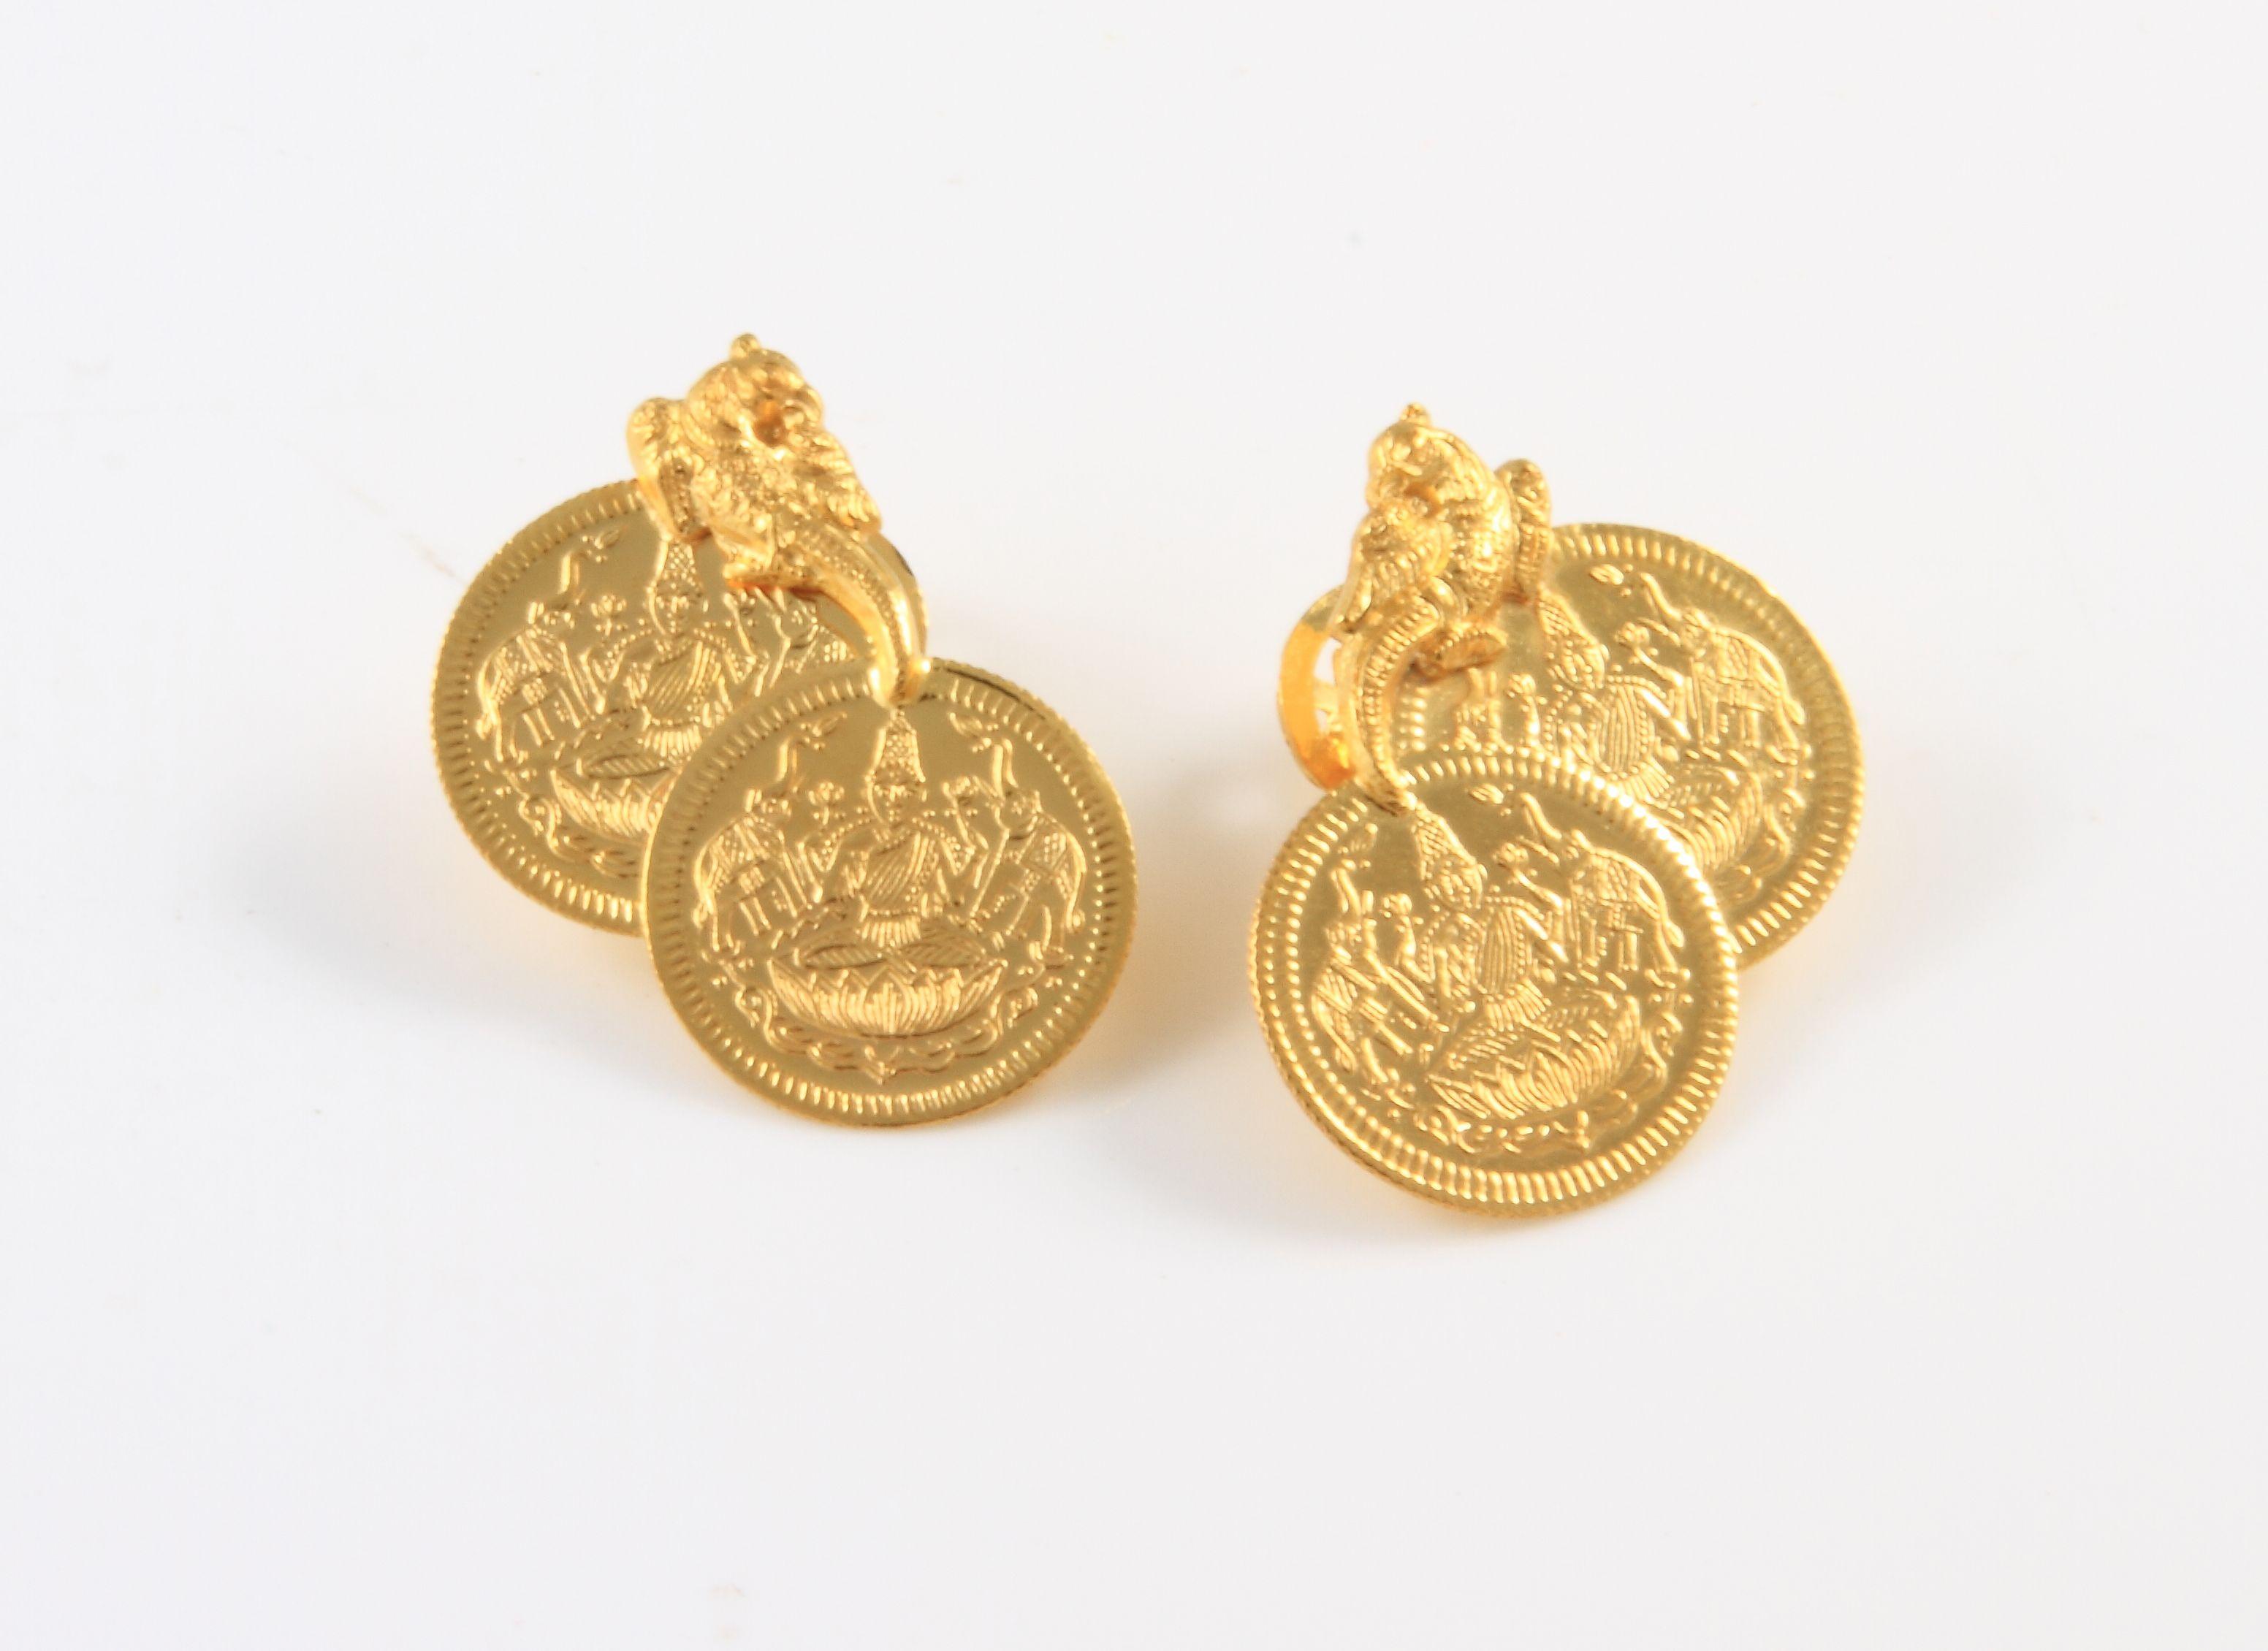 gold lakshmi coinsquotlakshmi quot goddess of wealth studs in